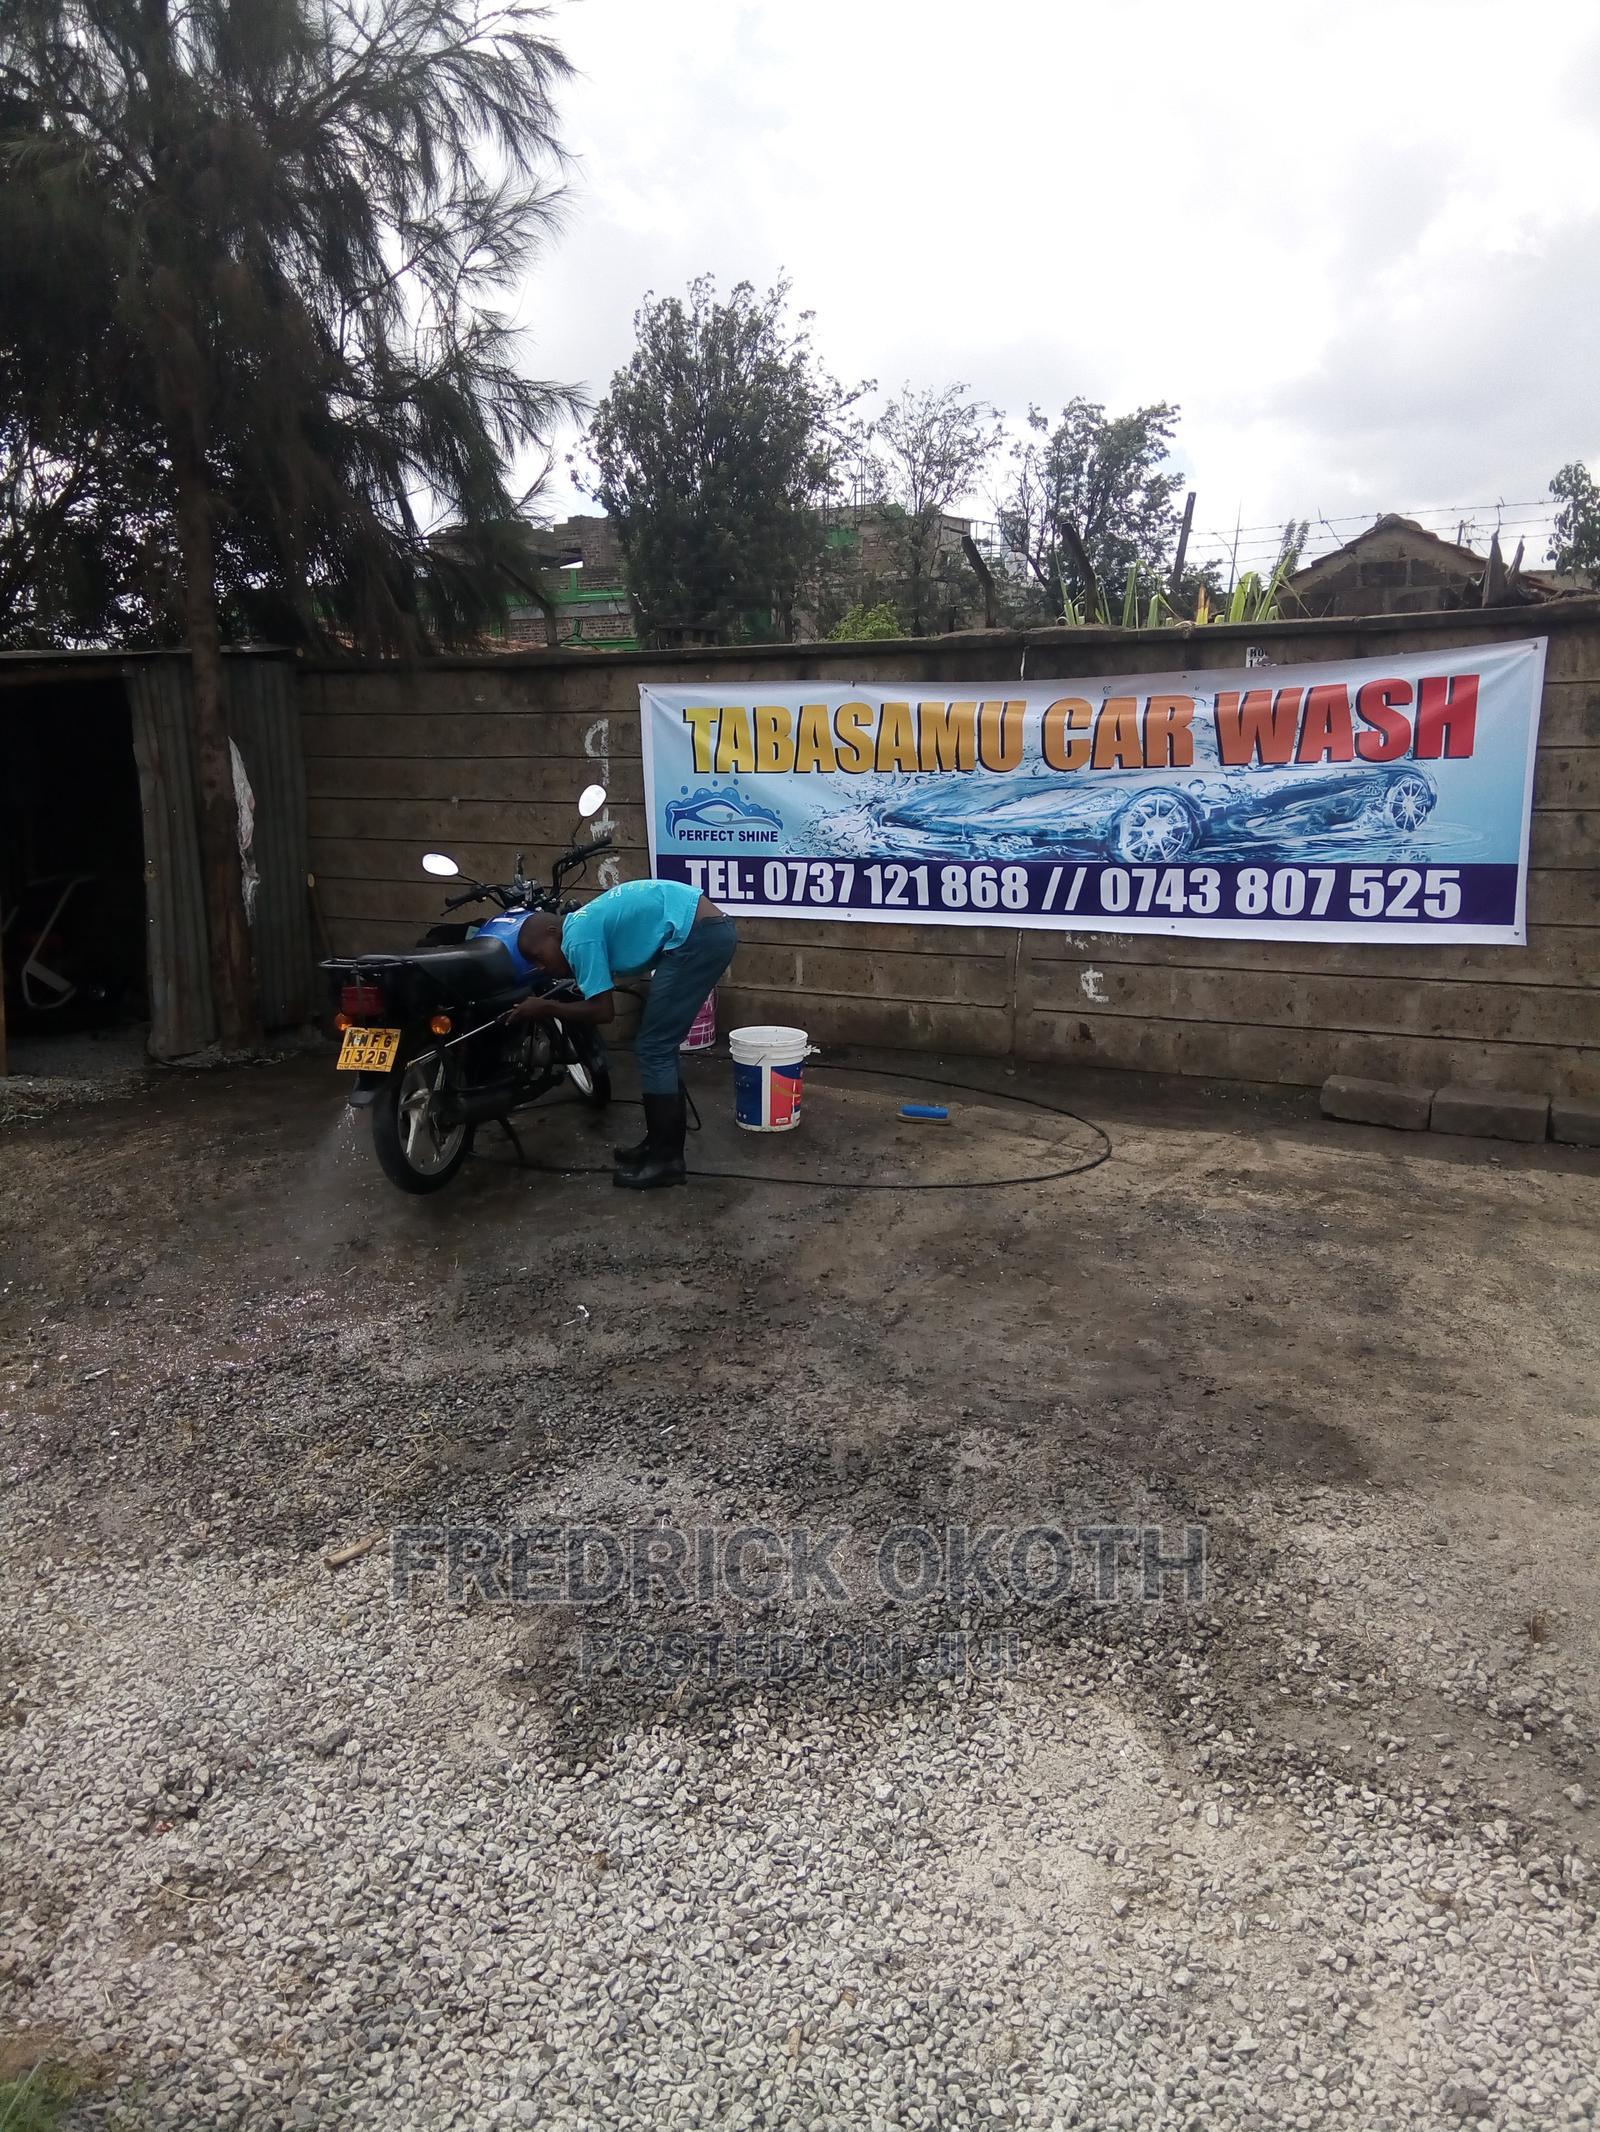 Carwash for Sale | Commercial Property For Sale for sale in Gikomba/Kamukunji, Nairobi, Kenya